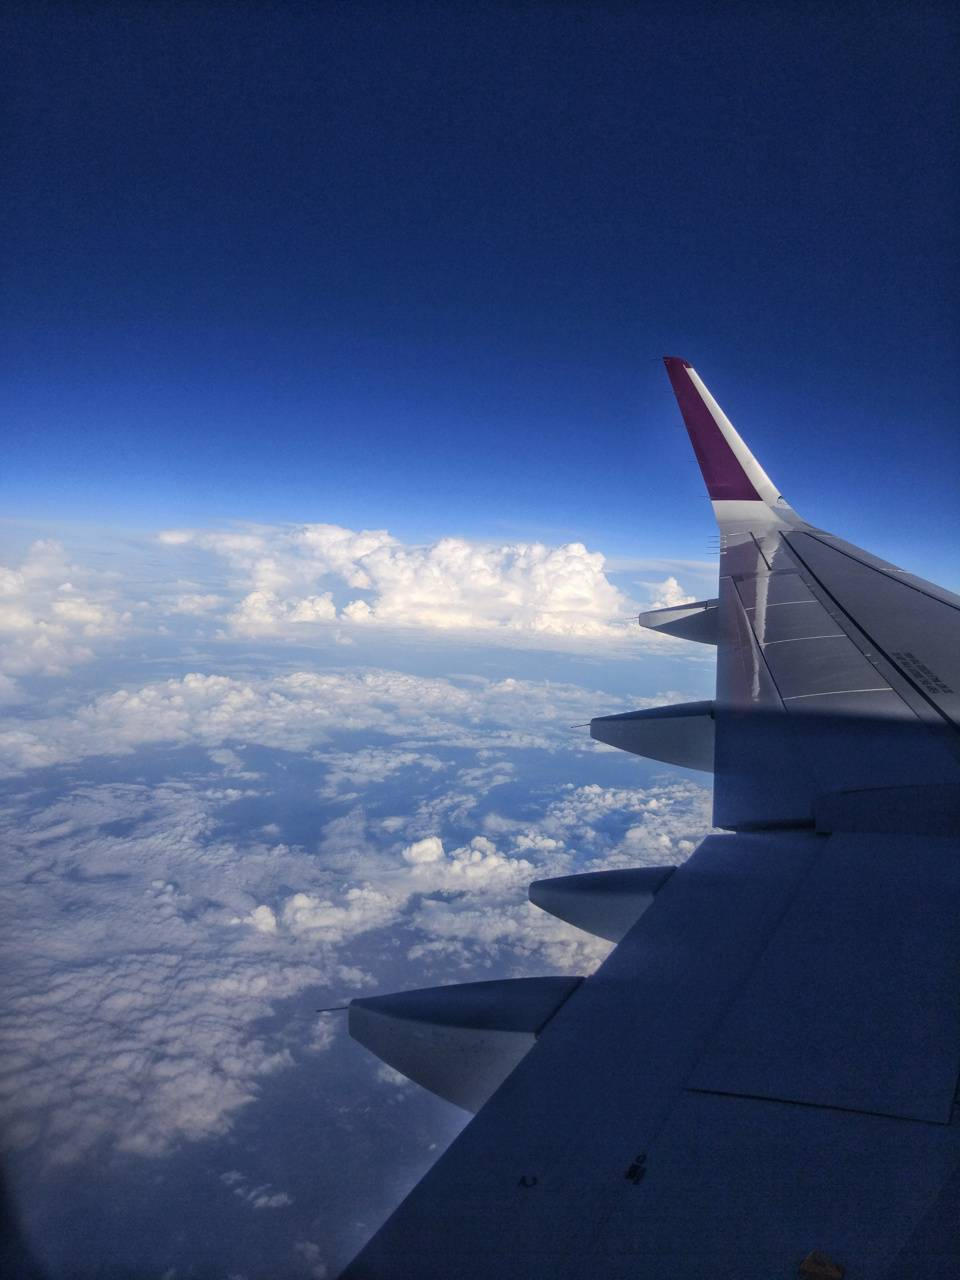 Airplane fin